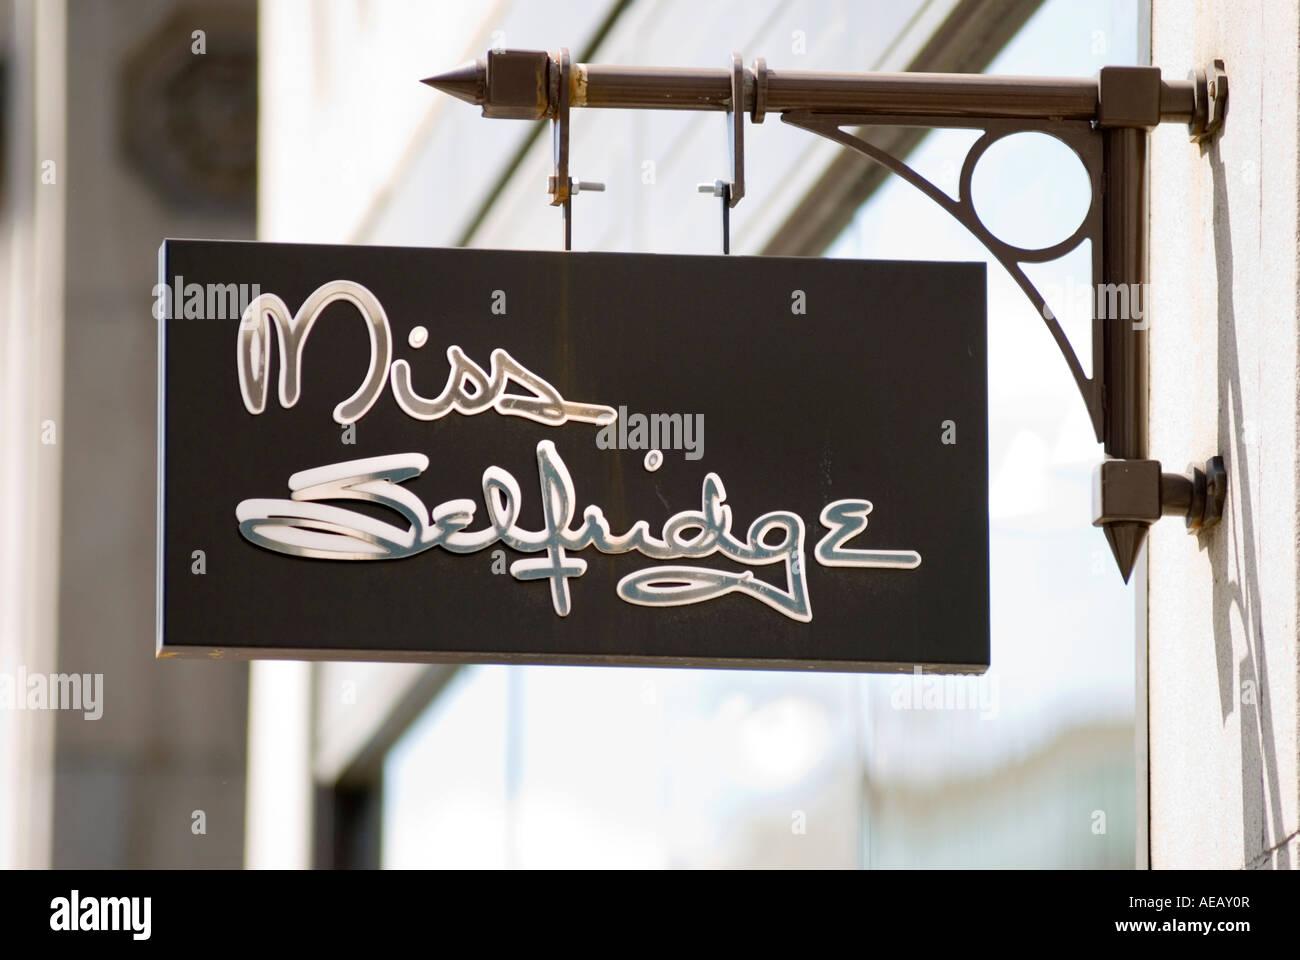 Miss Selfridge shop sign on Oxford Street in central London UK - Stock Image